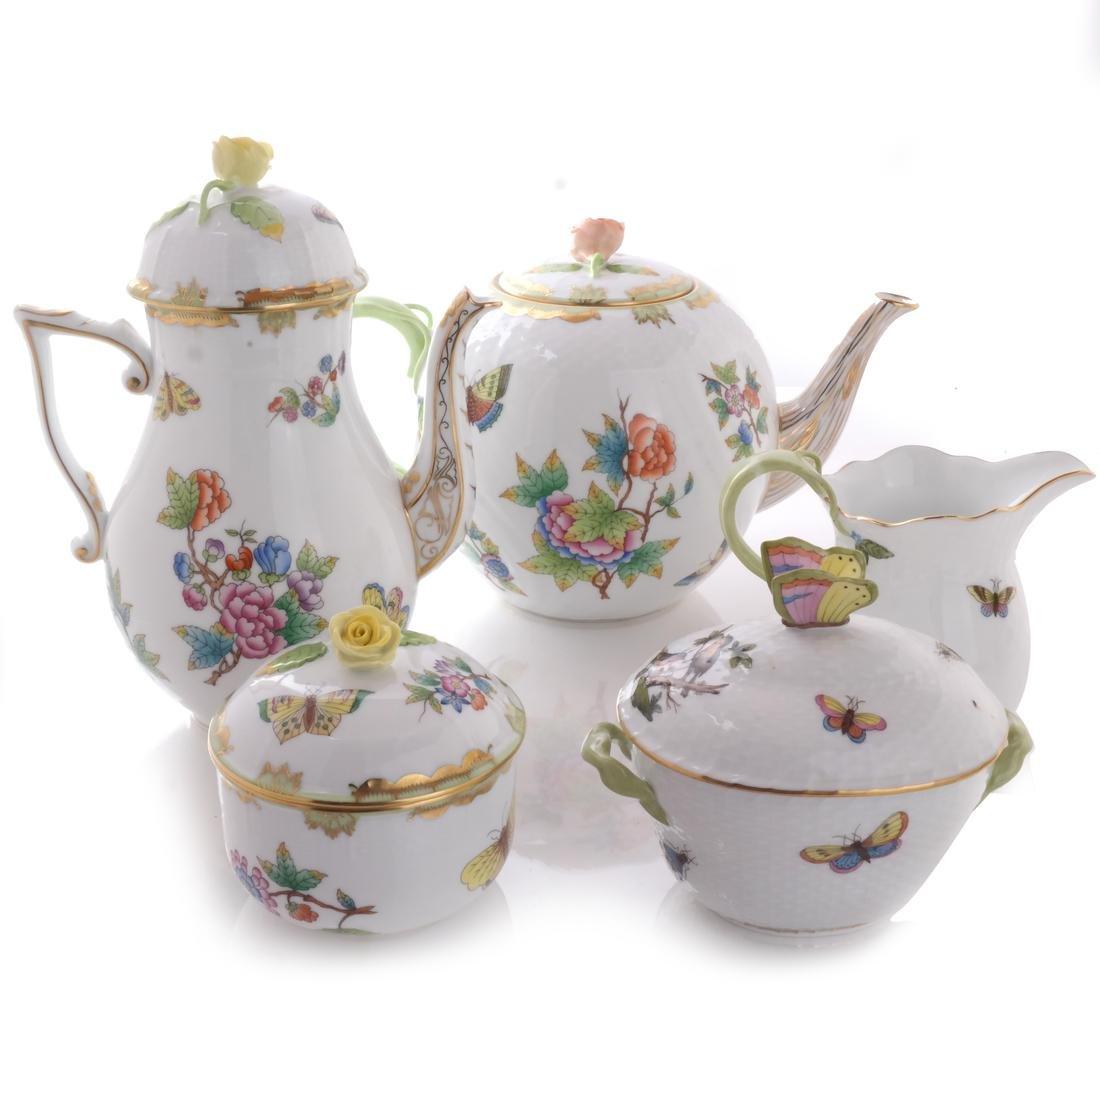 Five Herend Porcelain Tea Articles